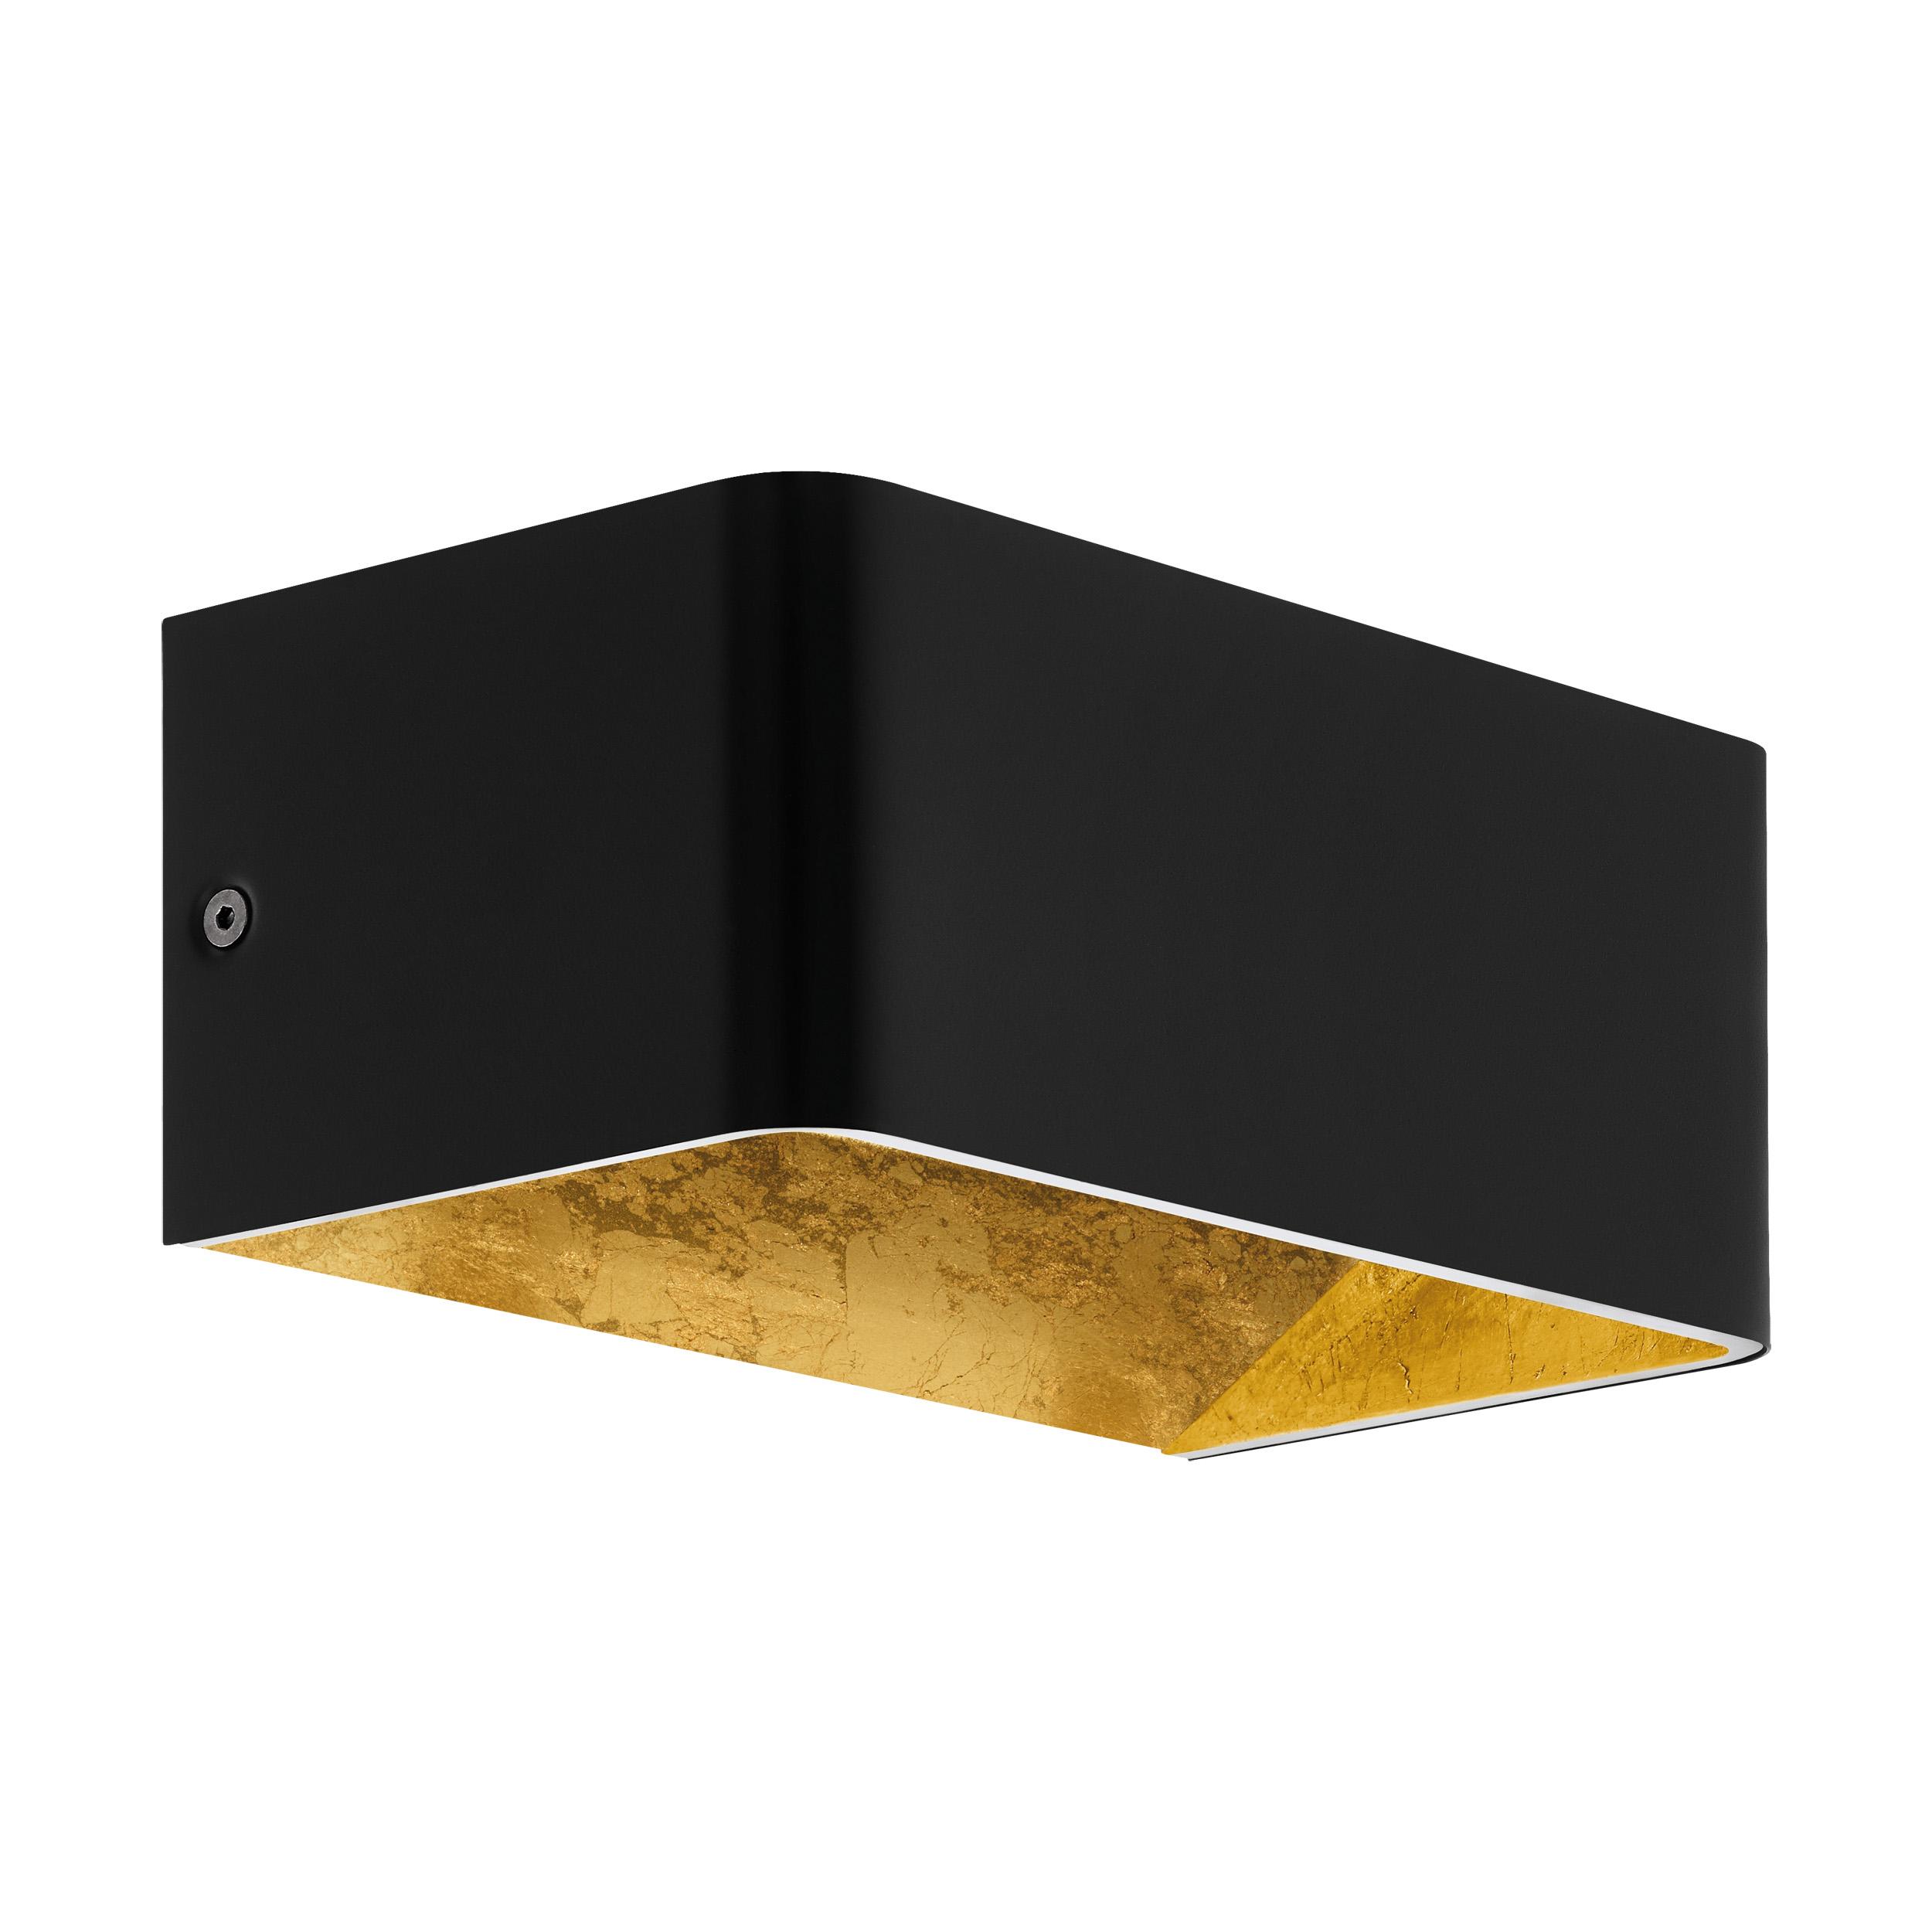 1 Stk Wandleuchte Sania 3 10W 3000K schwarz /blattvergoldet IP20 LI64559---